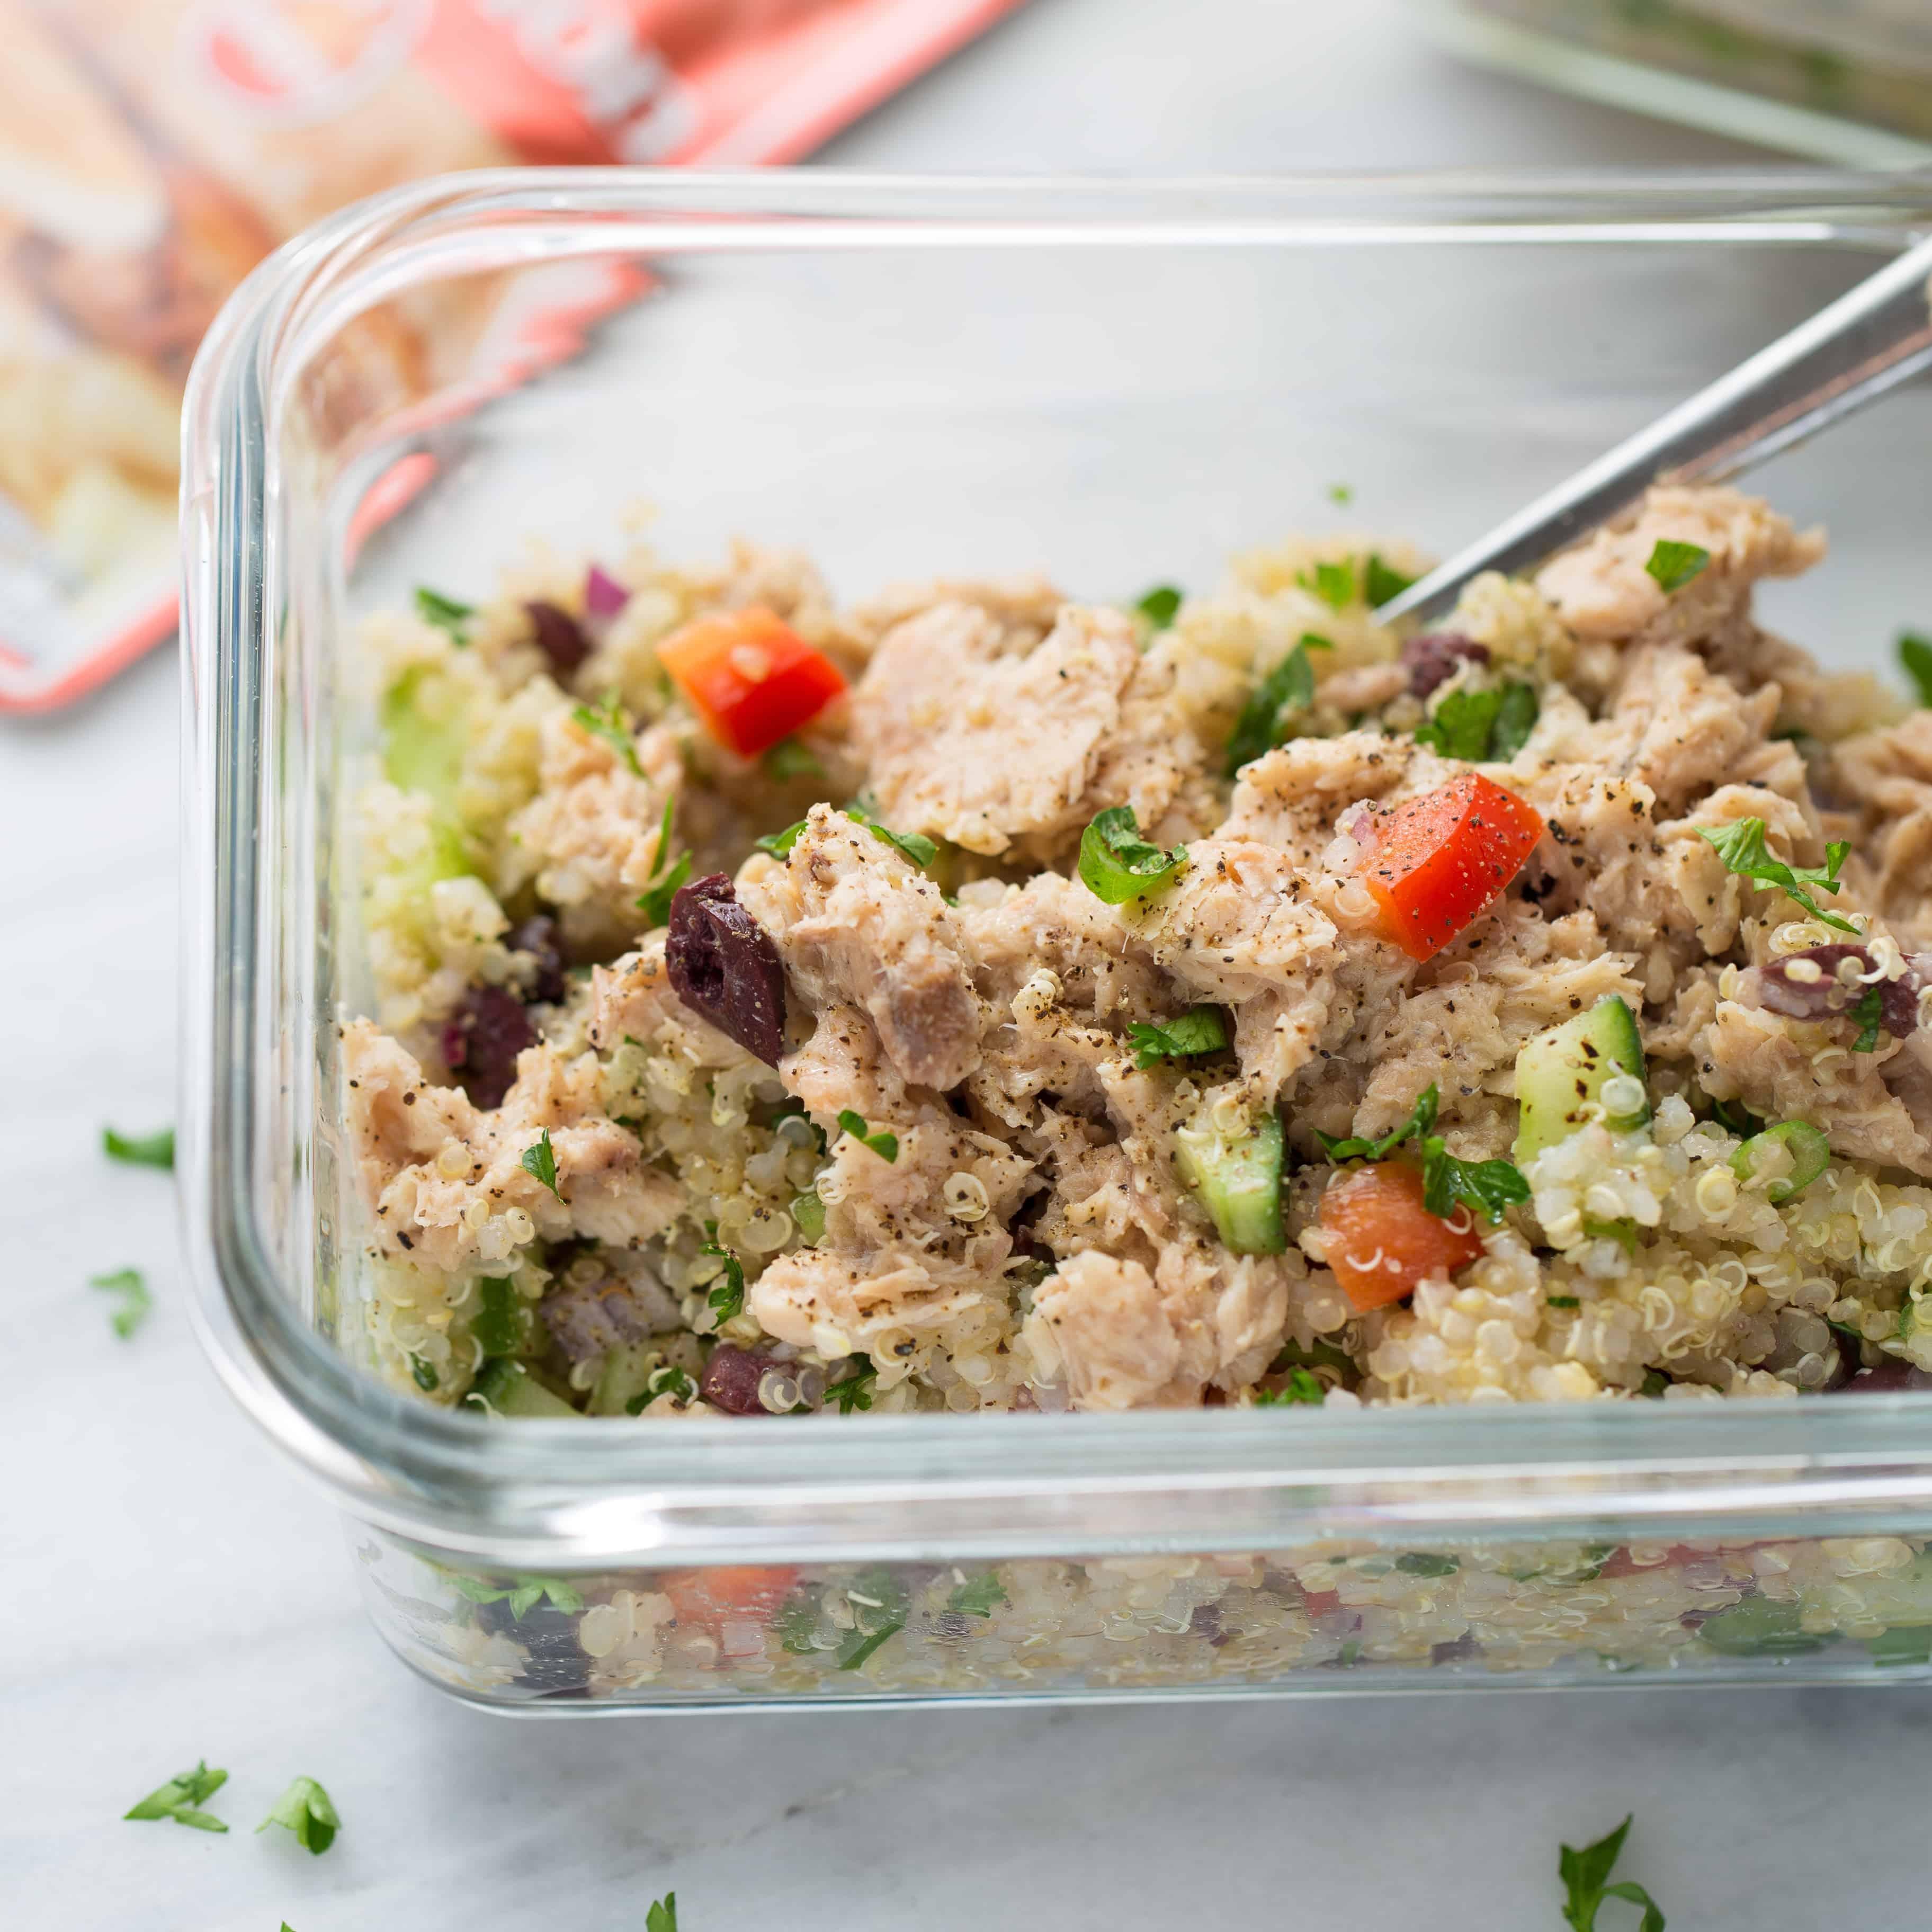 Make-Ahead Quinoa Salad with Lemon Pepper Salmon